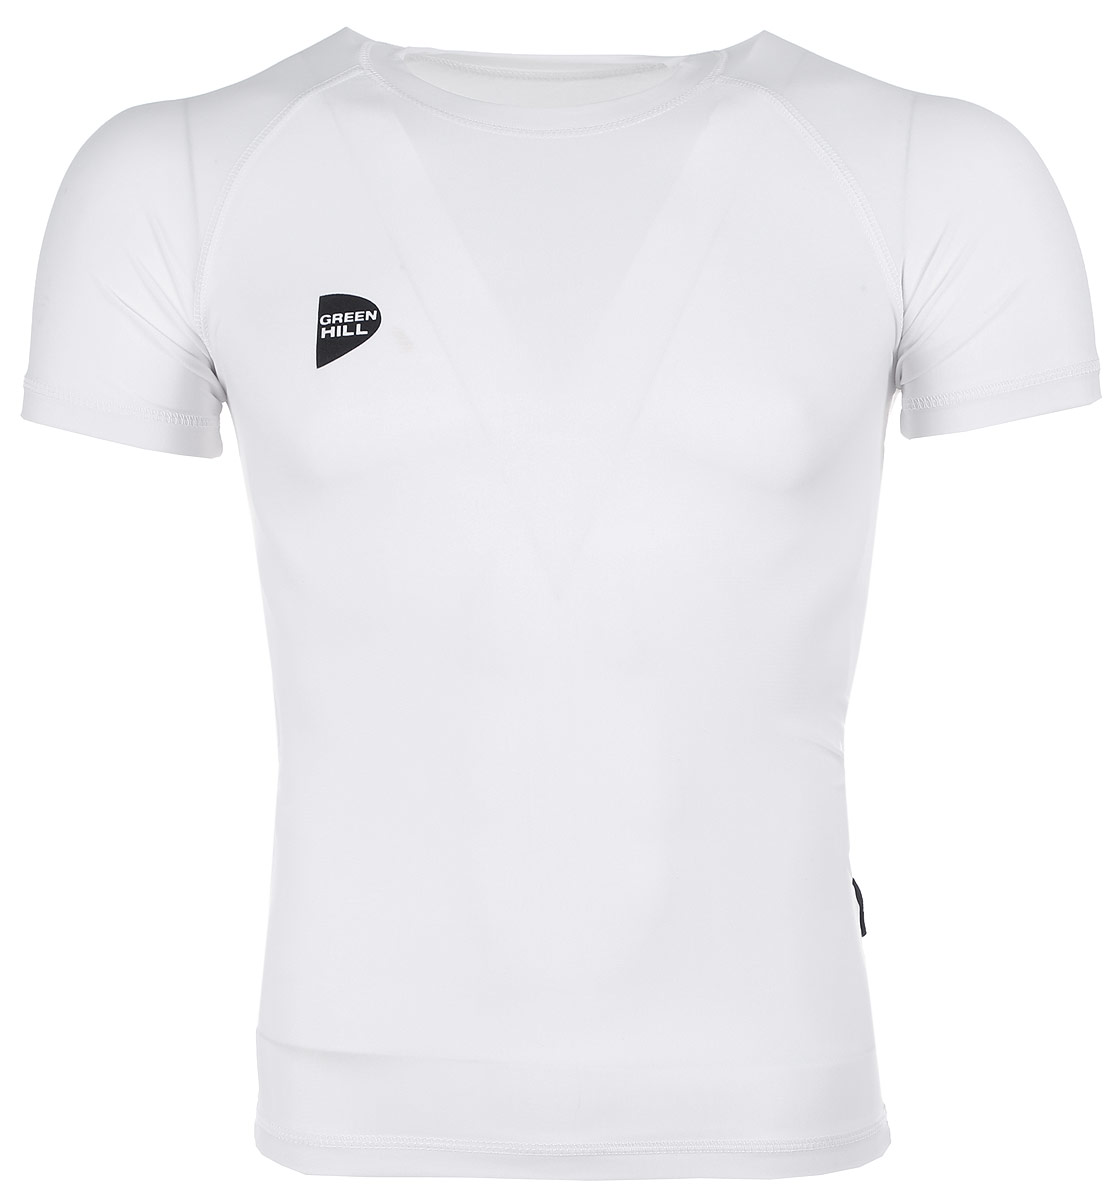 Защитная футболка Green Hill, цвет: белый. Размер XXS. RGS-3558RGS-3558Защитная футболка с логотипом дзюдо. Материал: полиэстер/лайкра. Размеры: Длина 60 см ширина 35 см